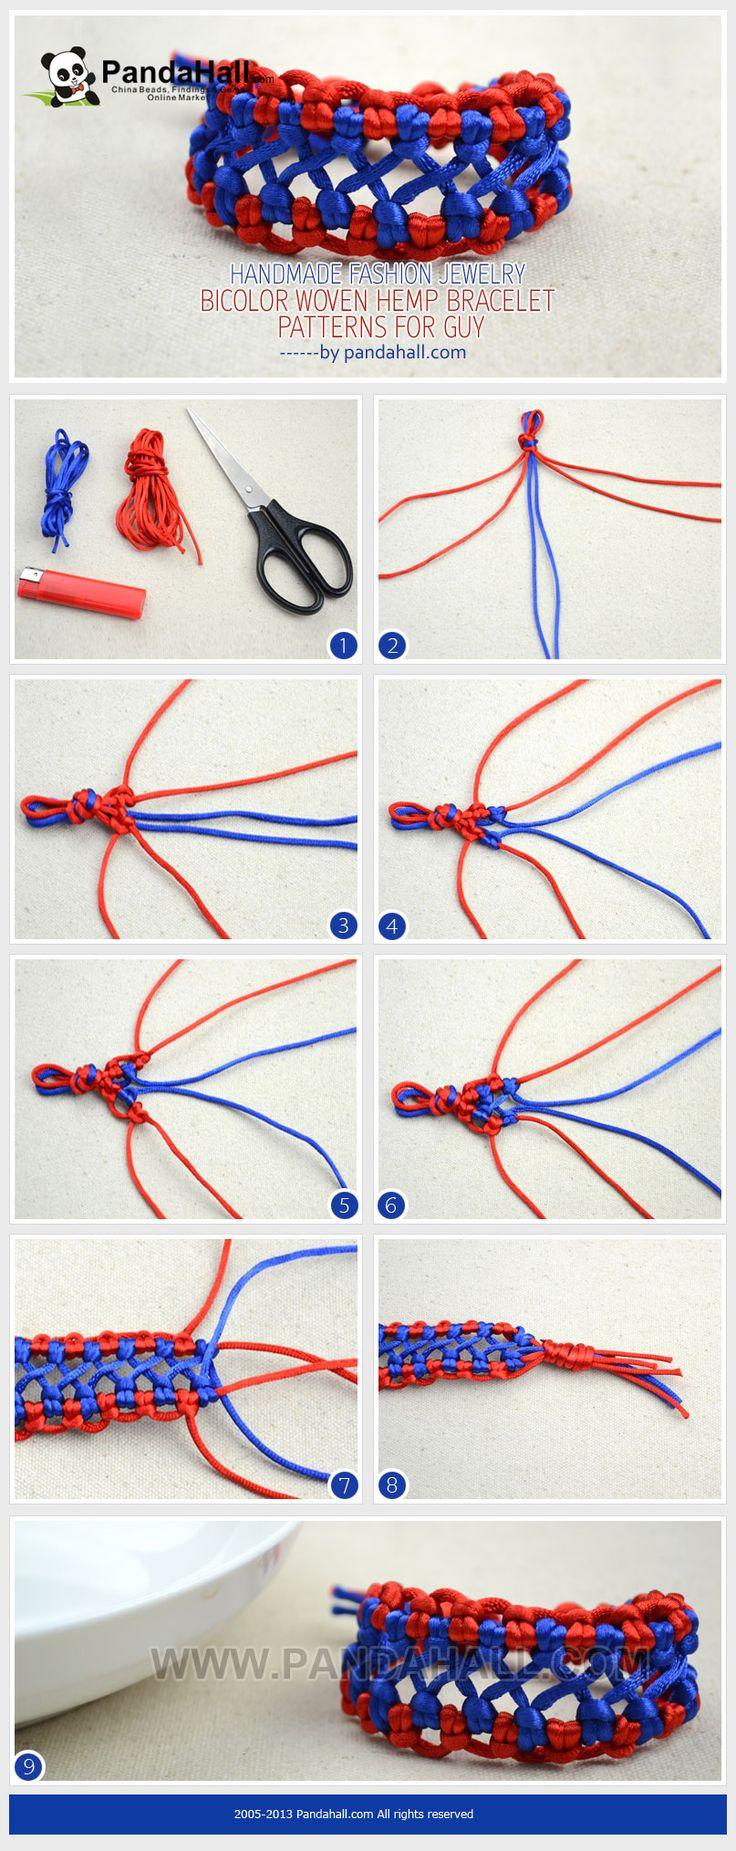 Handmade Fashion Jewelry Bicolor Woven Hemp Bracelet Patterns For Guys  From Pandahall